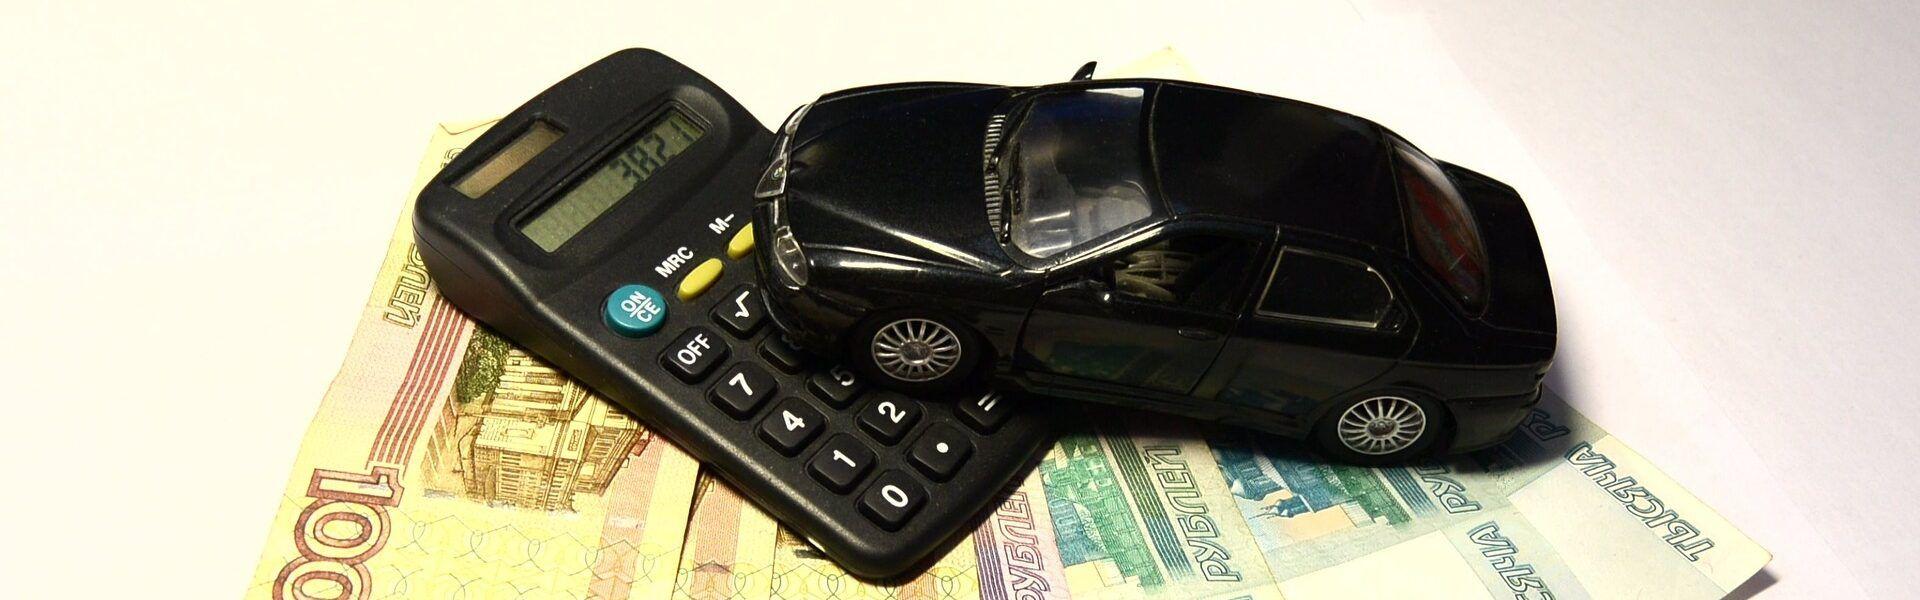 financiar-o-no-un-vehiculo